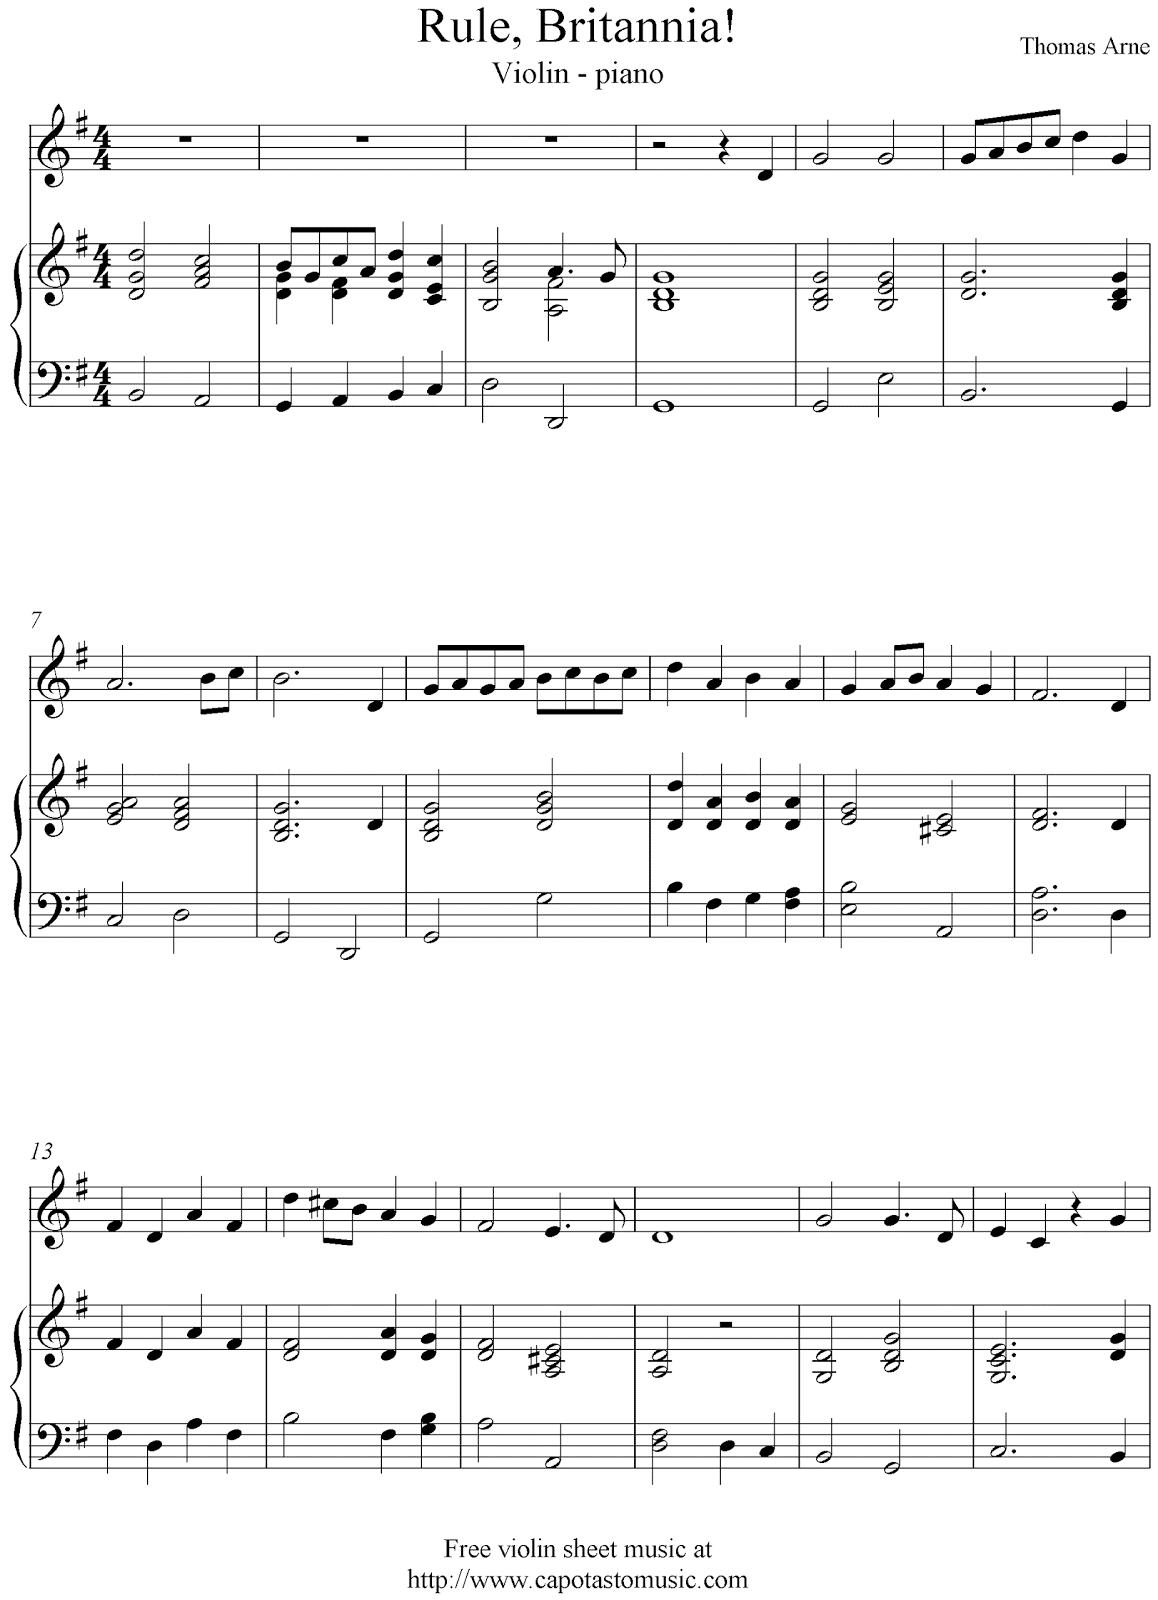 Free violin and piano sheet music, Rule, Britannia!